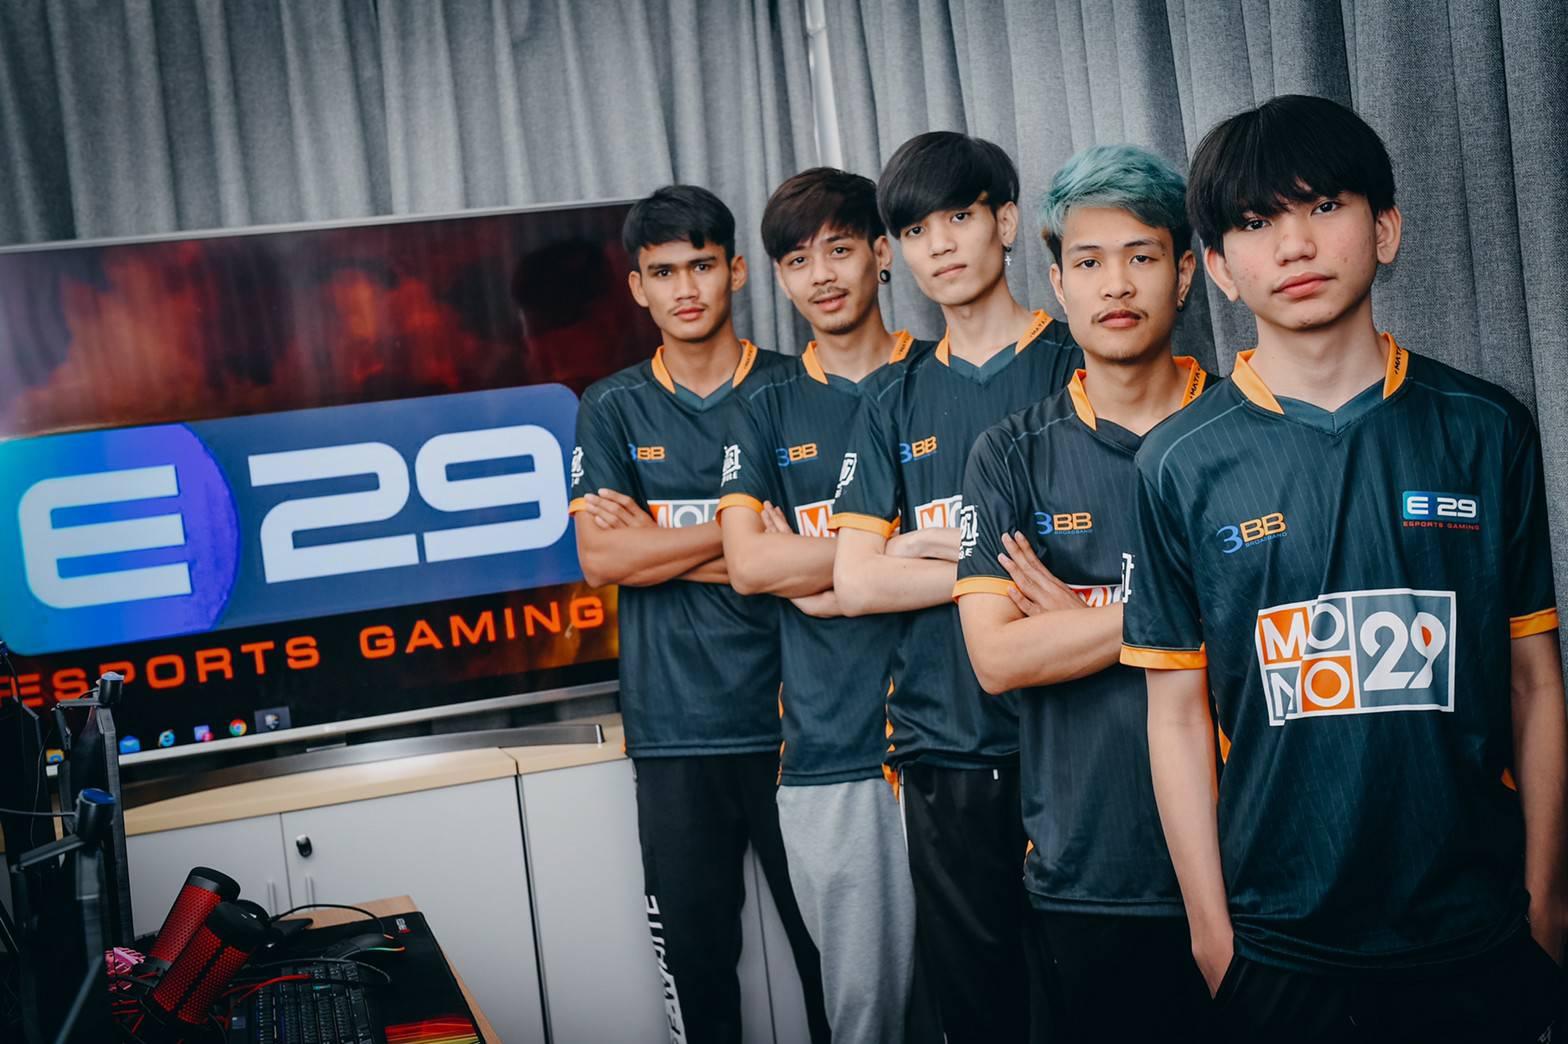 PUBG MOBILE PRO LEAGUE Thailand ทีม E29 Esports Gaming